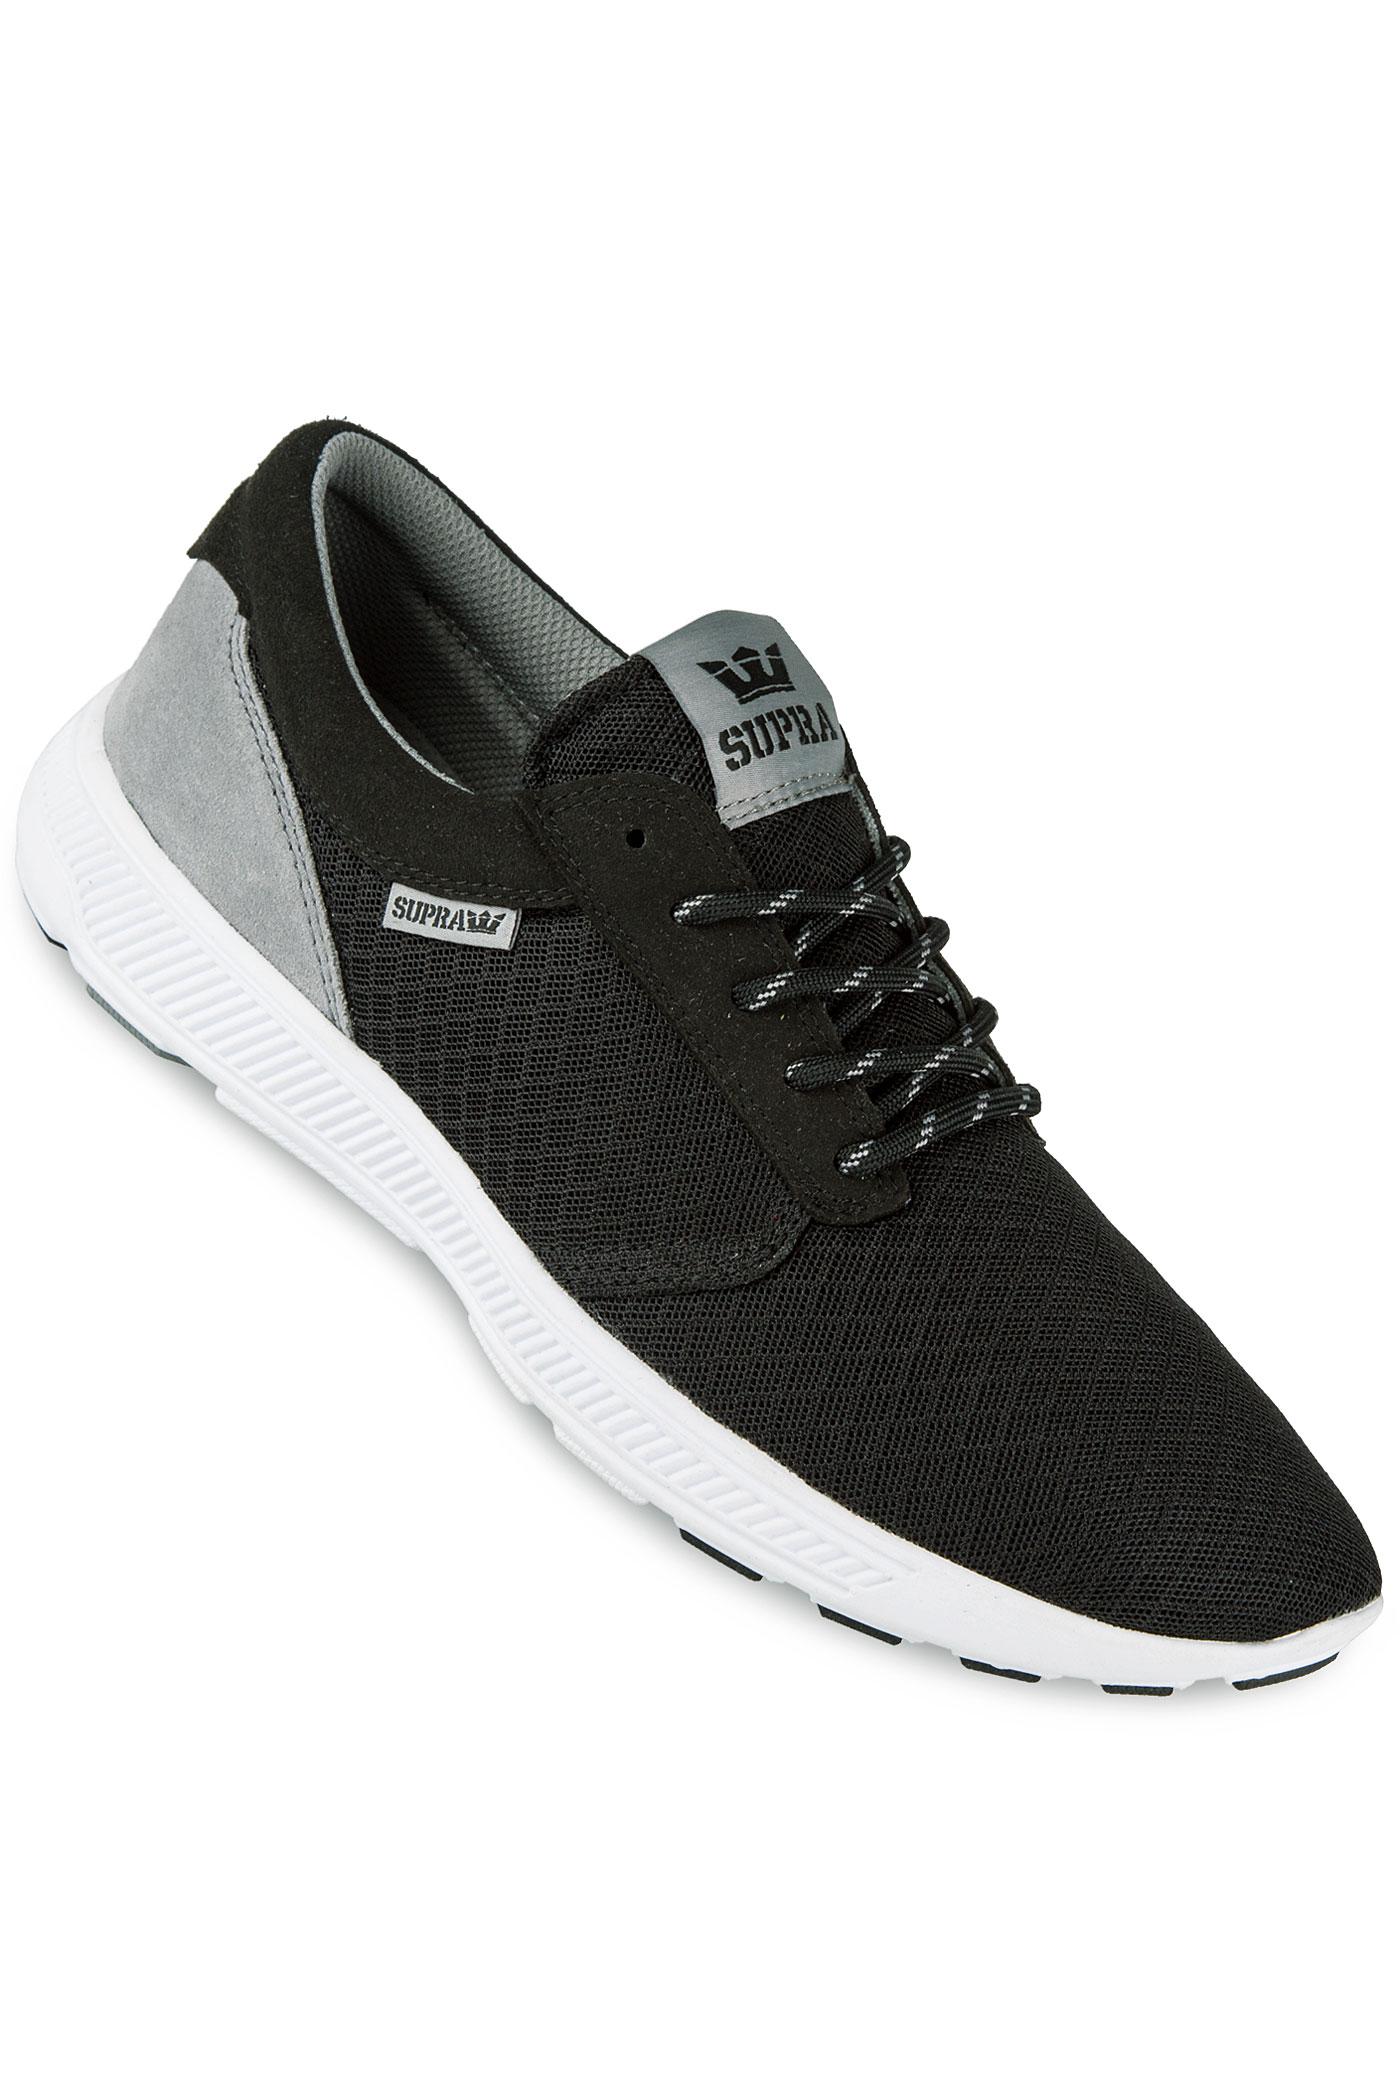 supra hammer run shoe black grey white buy at skatedeluxe. Black Bedroom Furniture Sets. Home Design Ideas